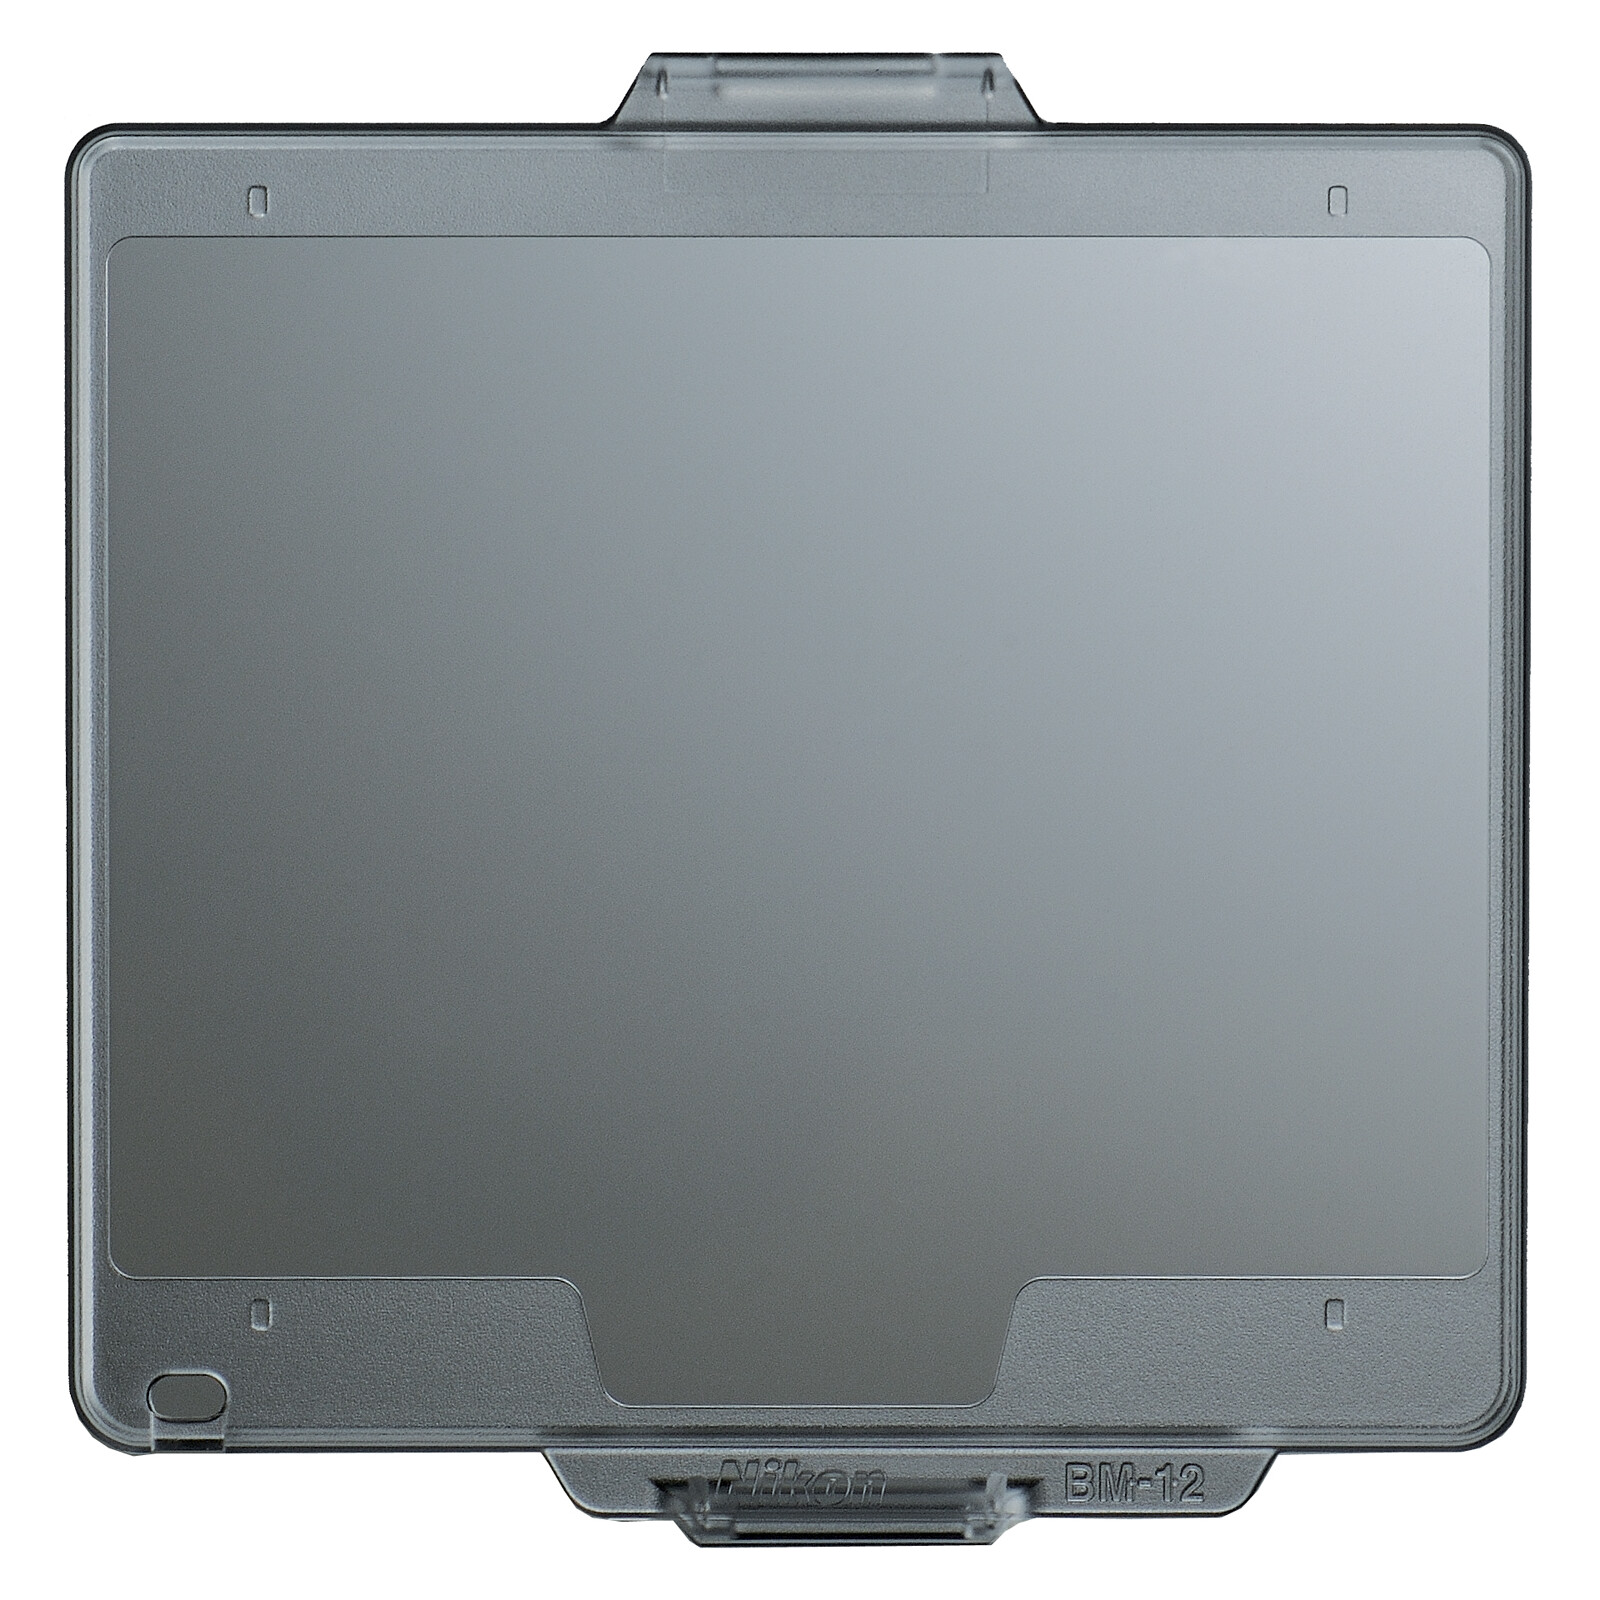 Nikon BM-12 Monitorabdeckung